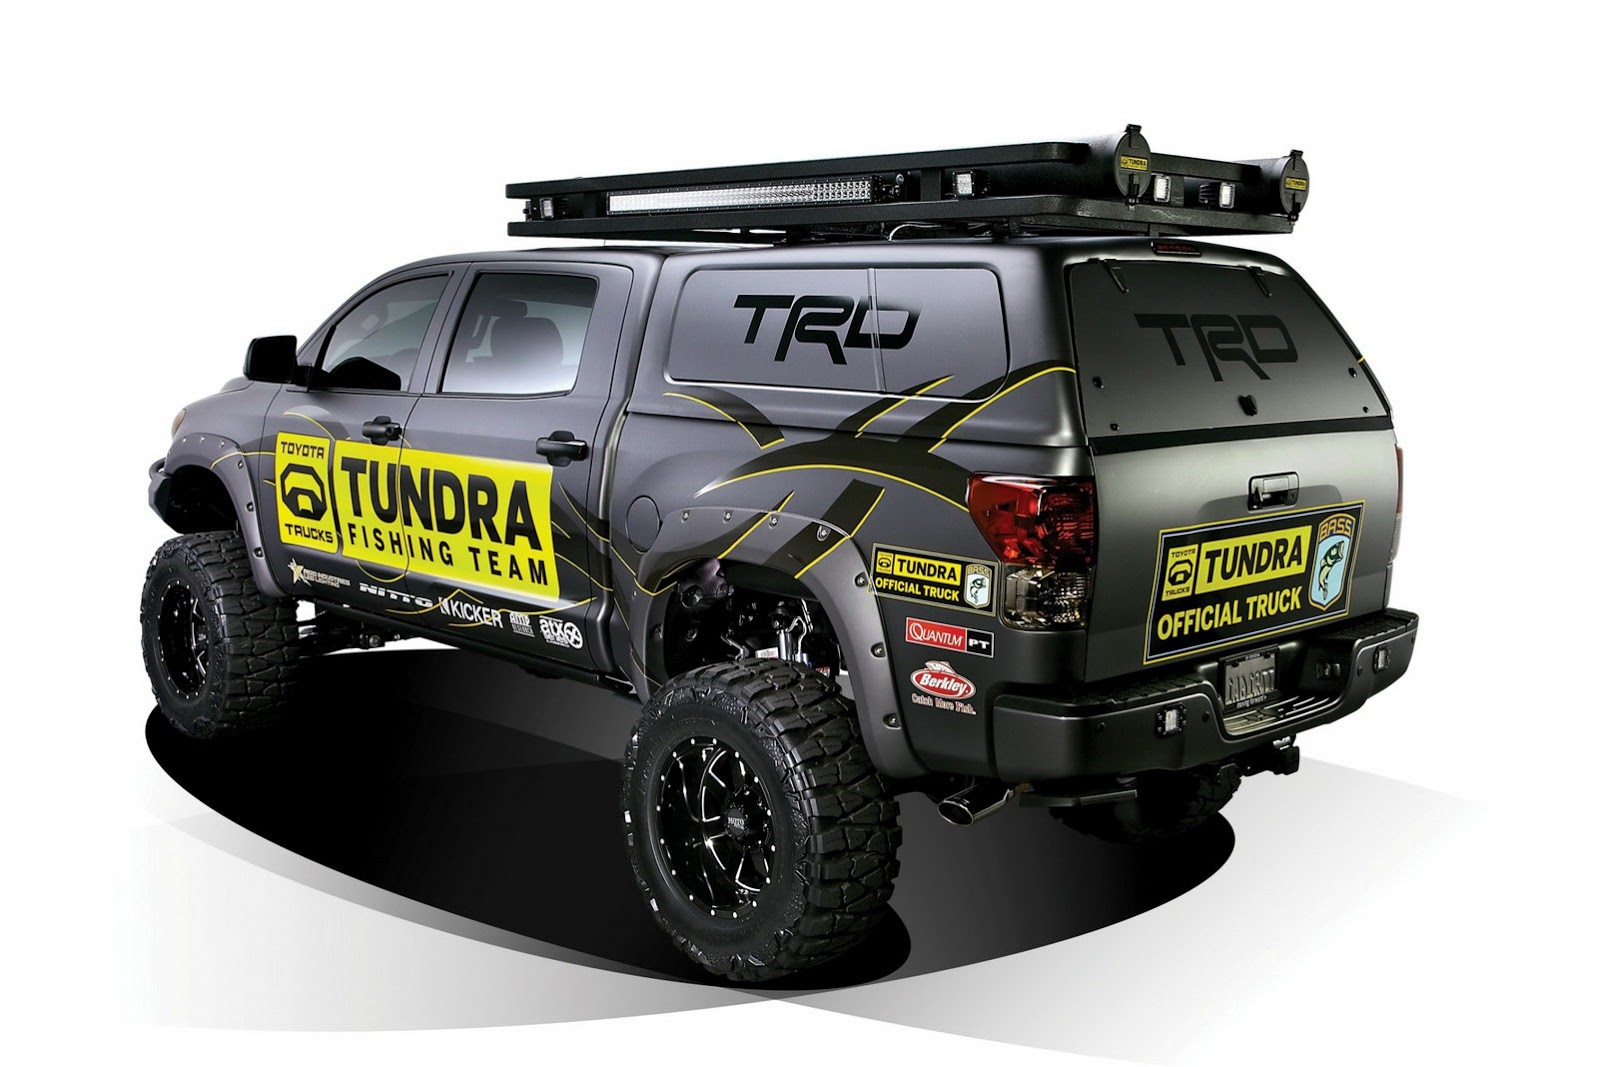 Cs Motorsport Trd Tundra Concept Brings Fishing To Sema